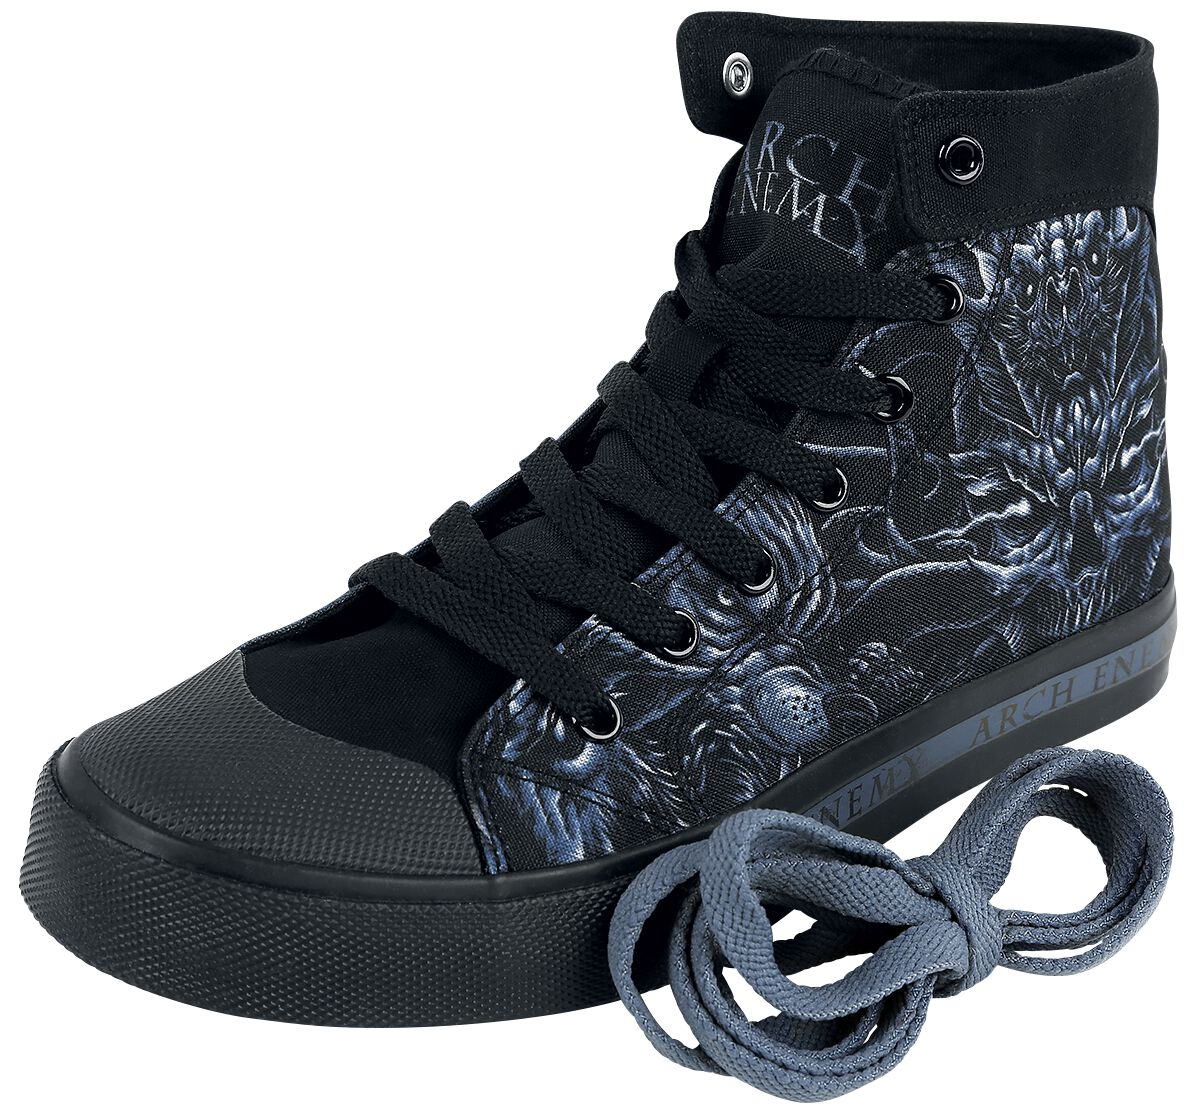 Image of Arch Enemy EMP Signature Collection Sneaker schwarz/blau